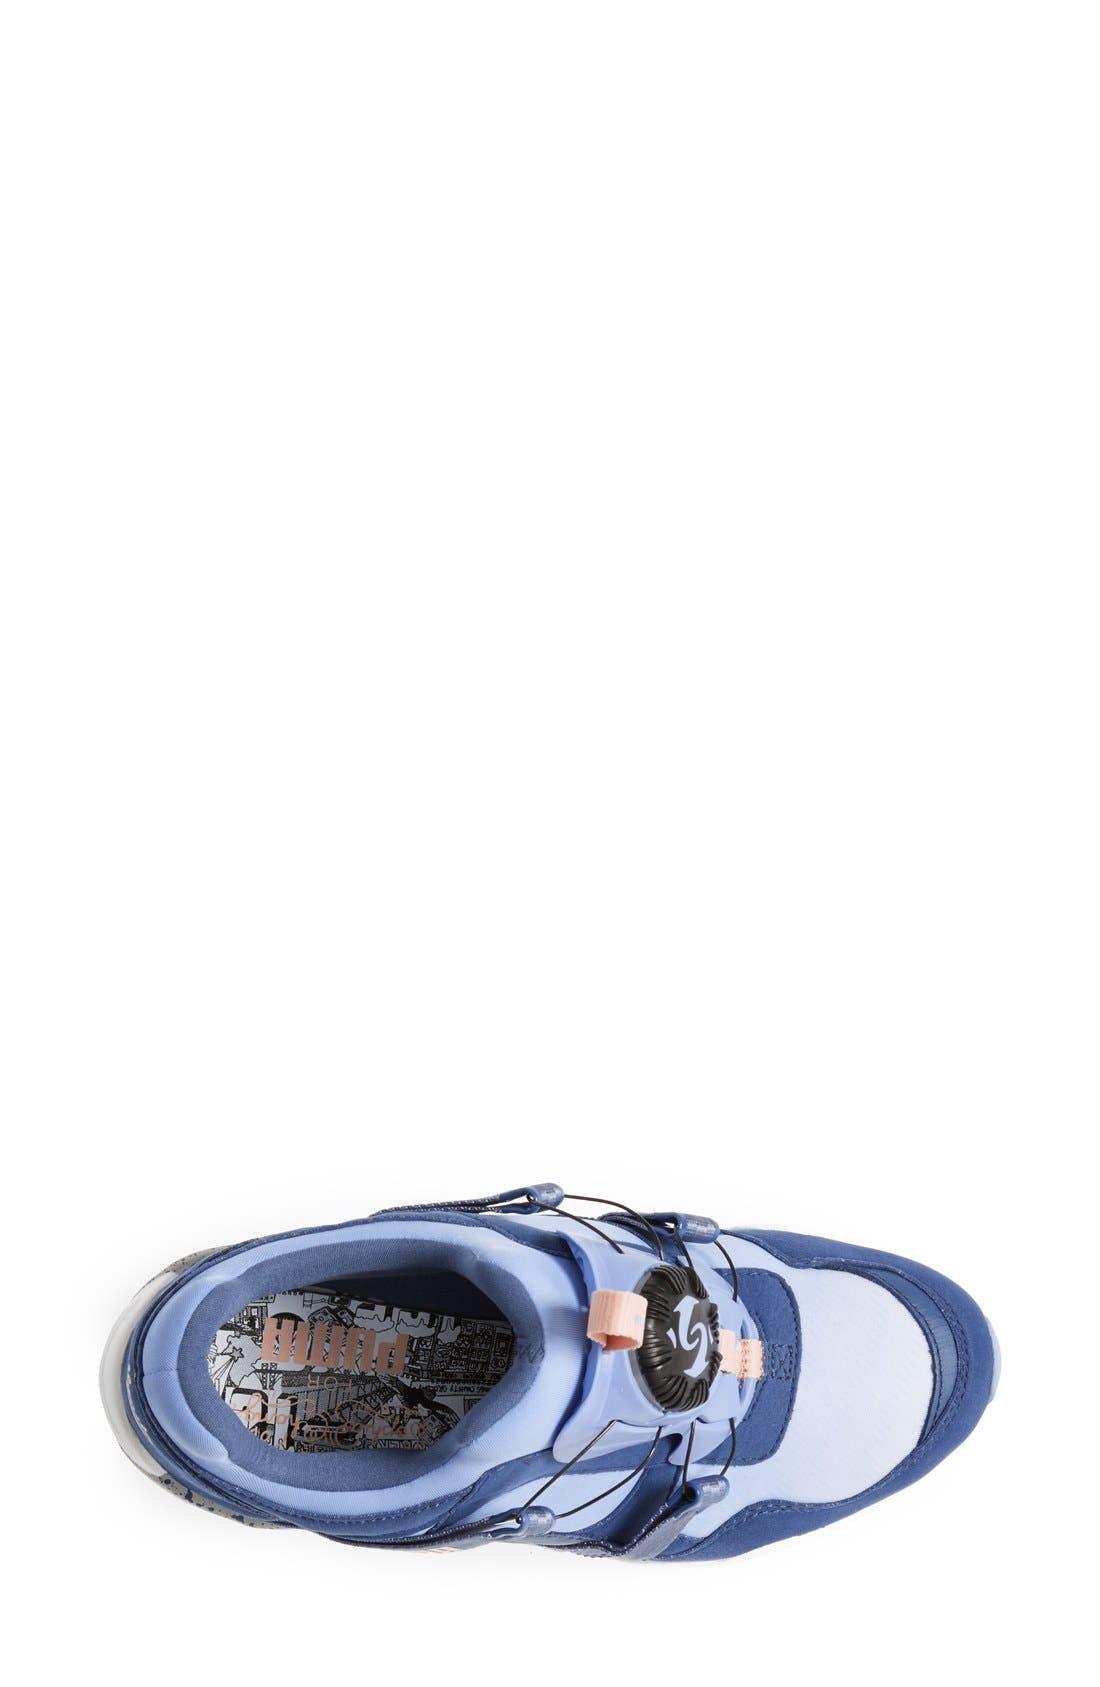 Alternate Image 3  - PUMA 'Disc Trinomic - Sophia Chang' Wedge Sneaker (Women)